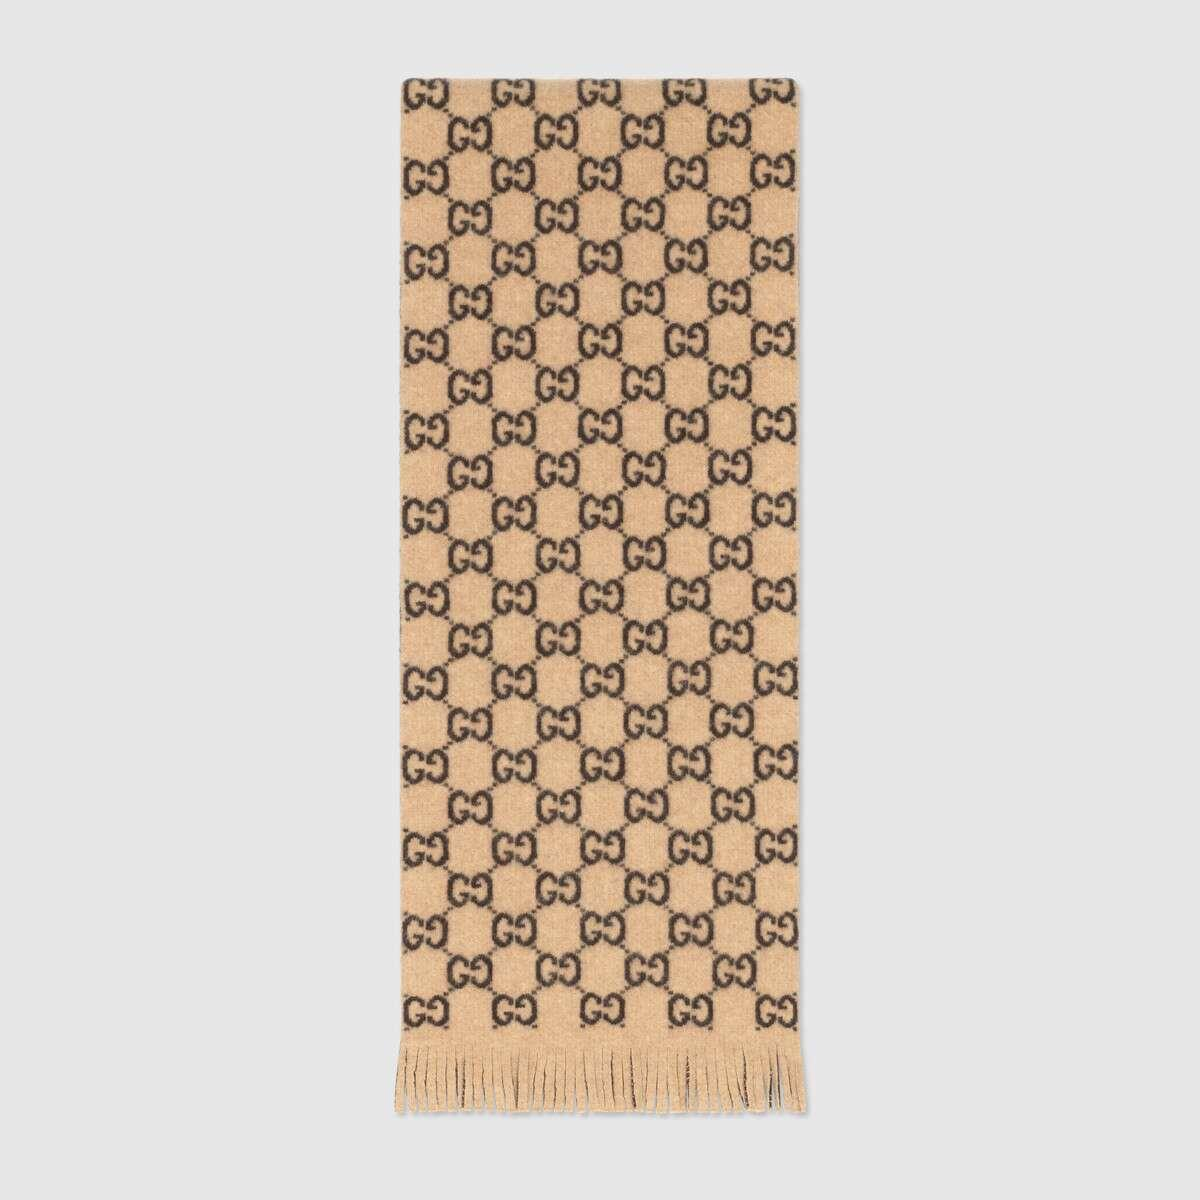 GG wool scarf